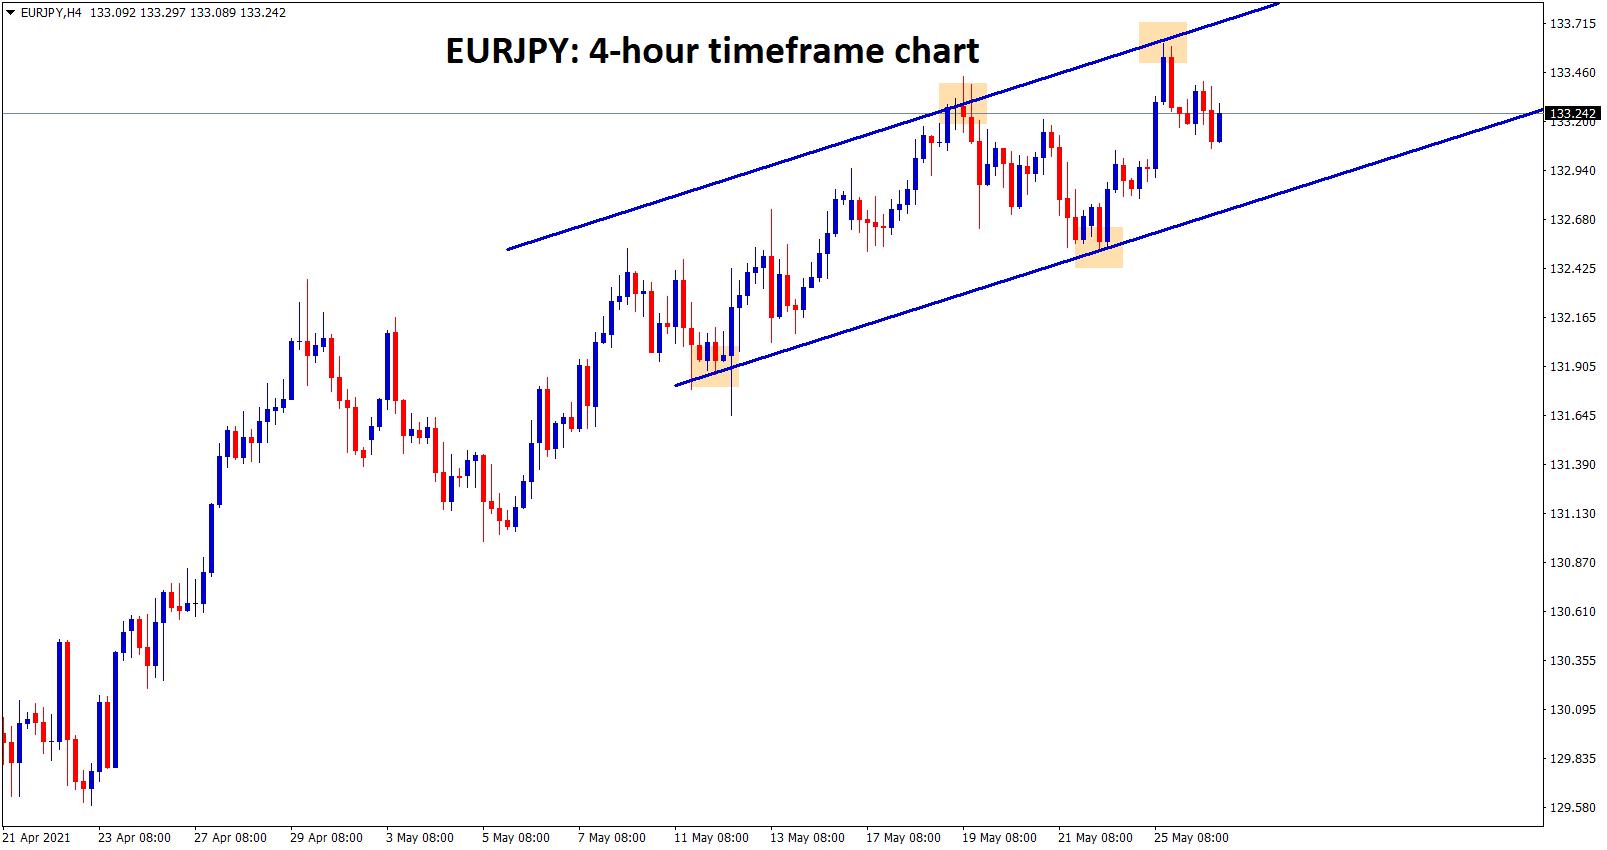 EURJPY moving in an ascending channel range